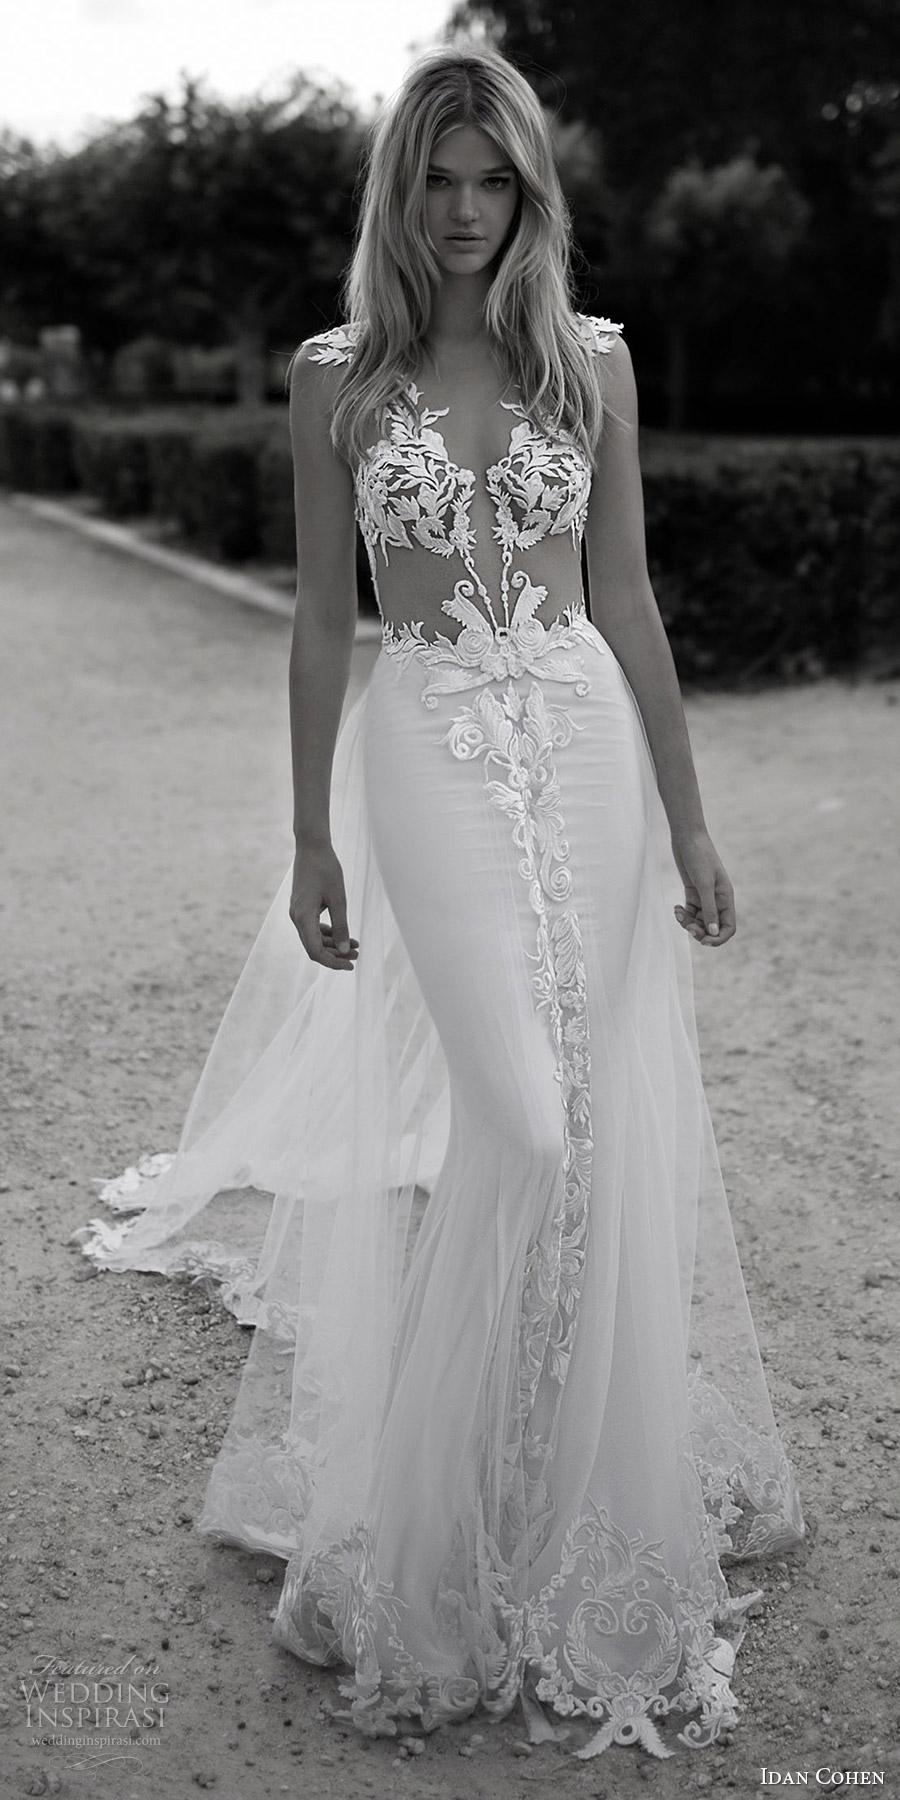 vestido de novia Idan Cohen 2017 manga del casquillo de la boda envoltura del cordón profundo cuello en v (Violette) mv tren